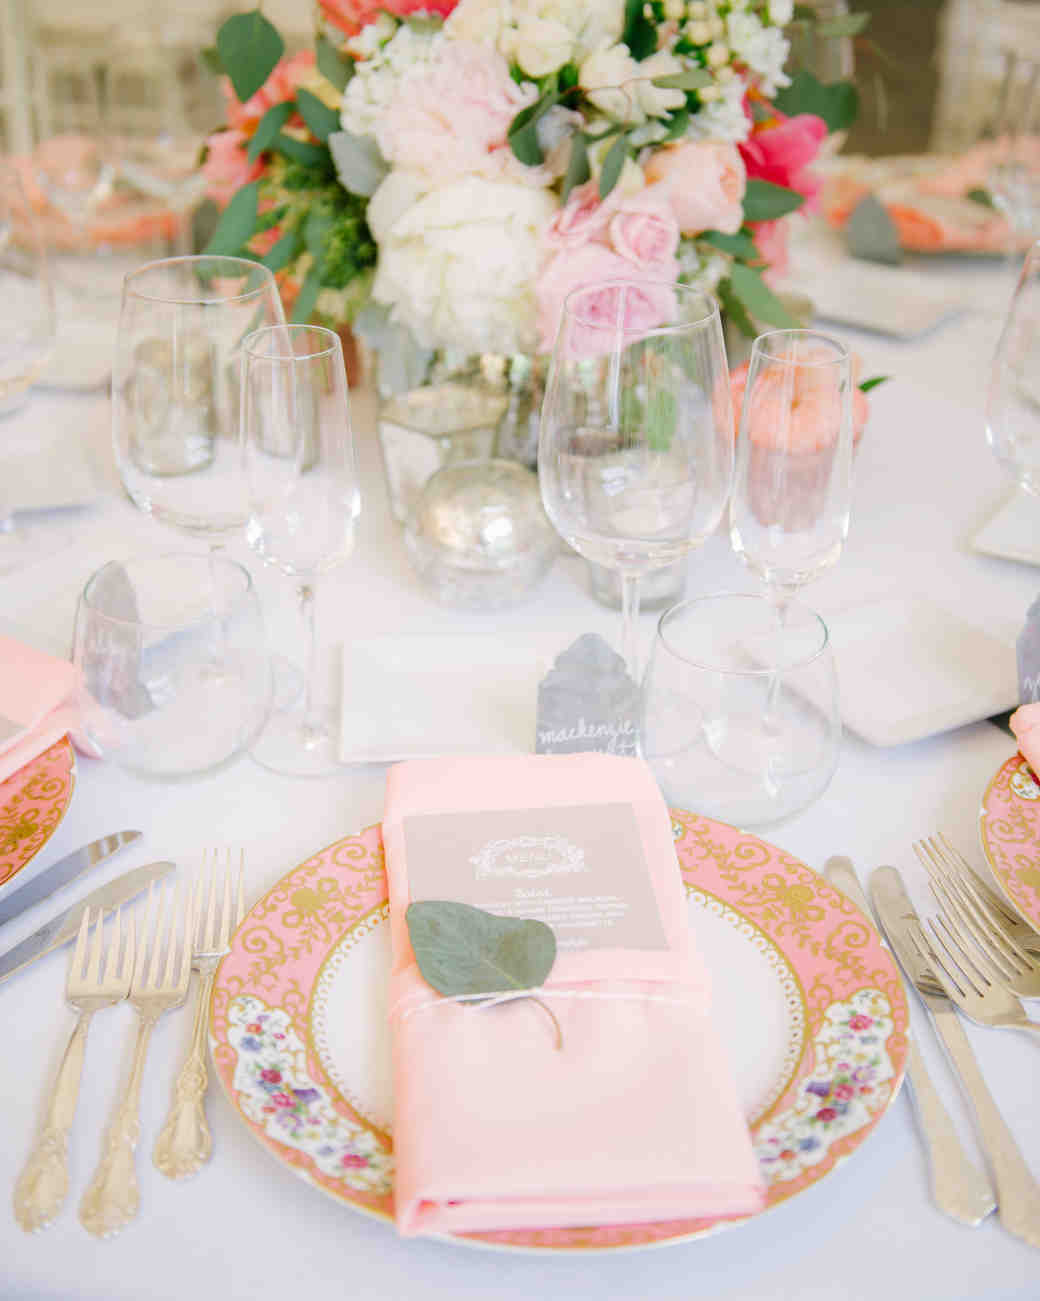 wedding plates pink floral